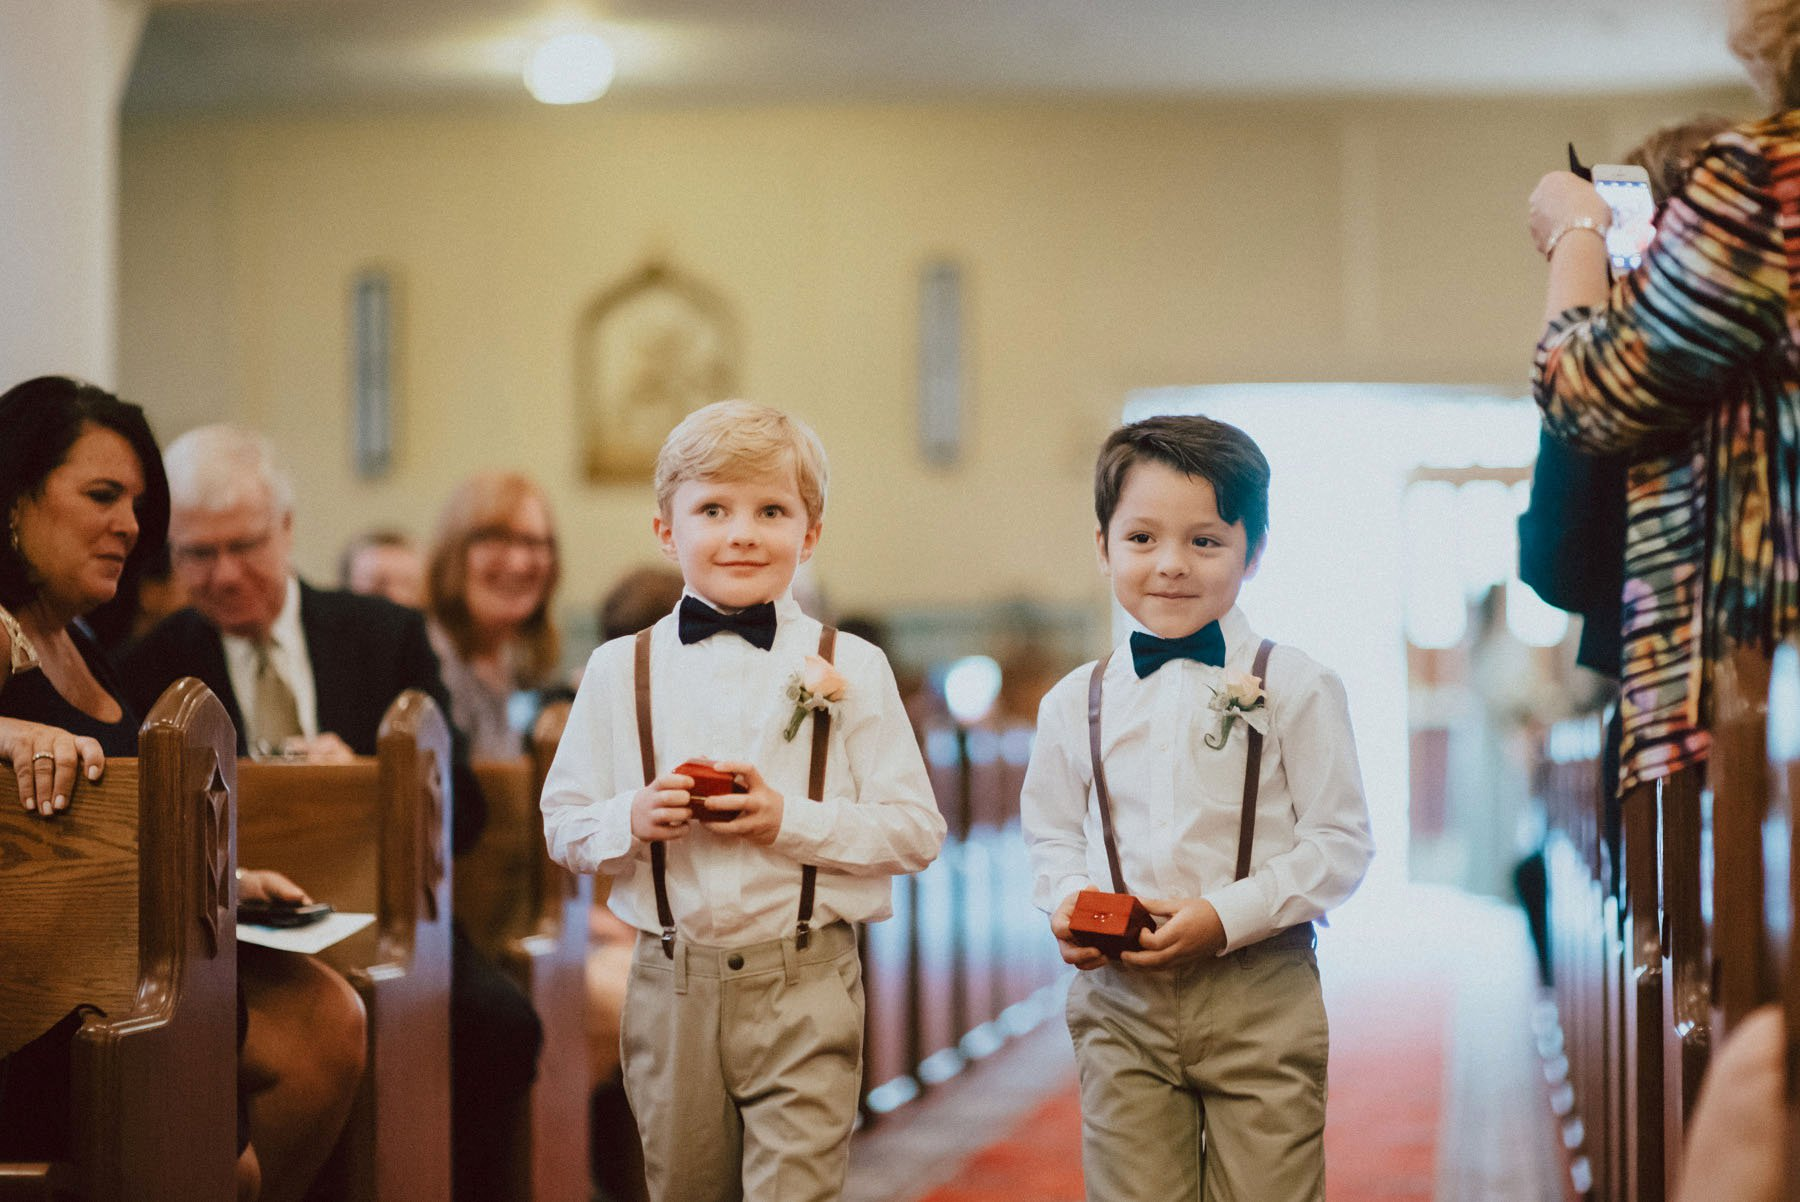 greenville-country-club-wedding-43.jpg